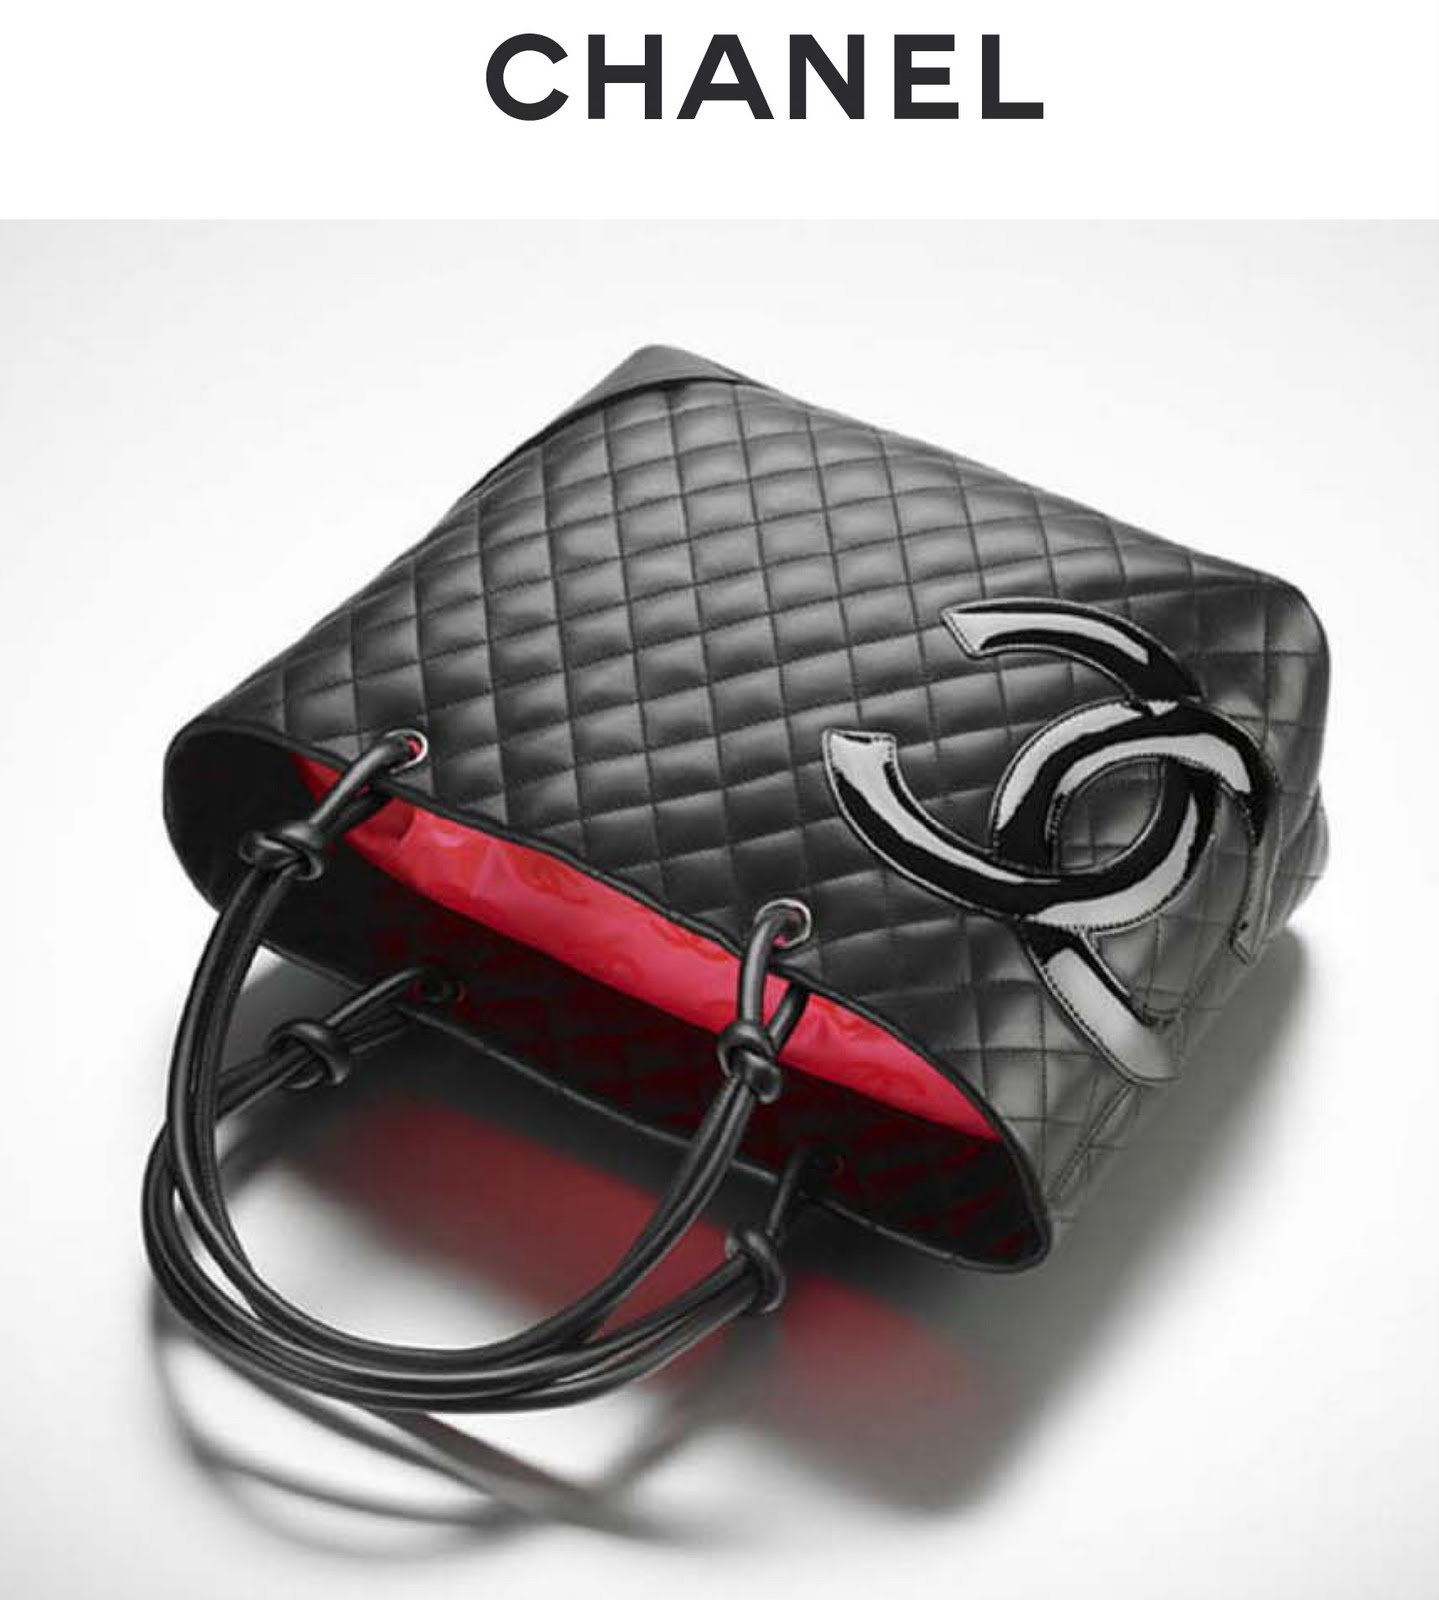 classic chanel bag price - photo #14